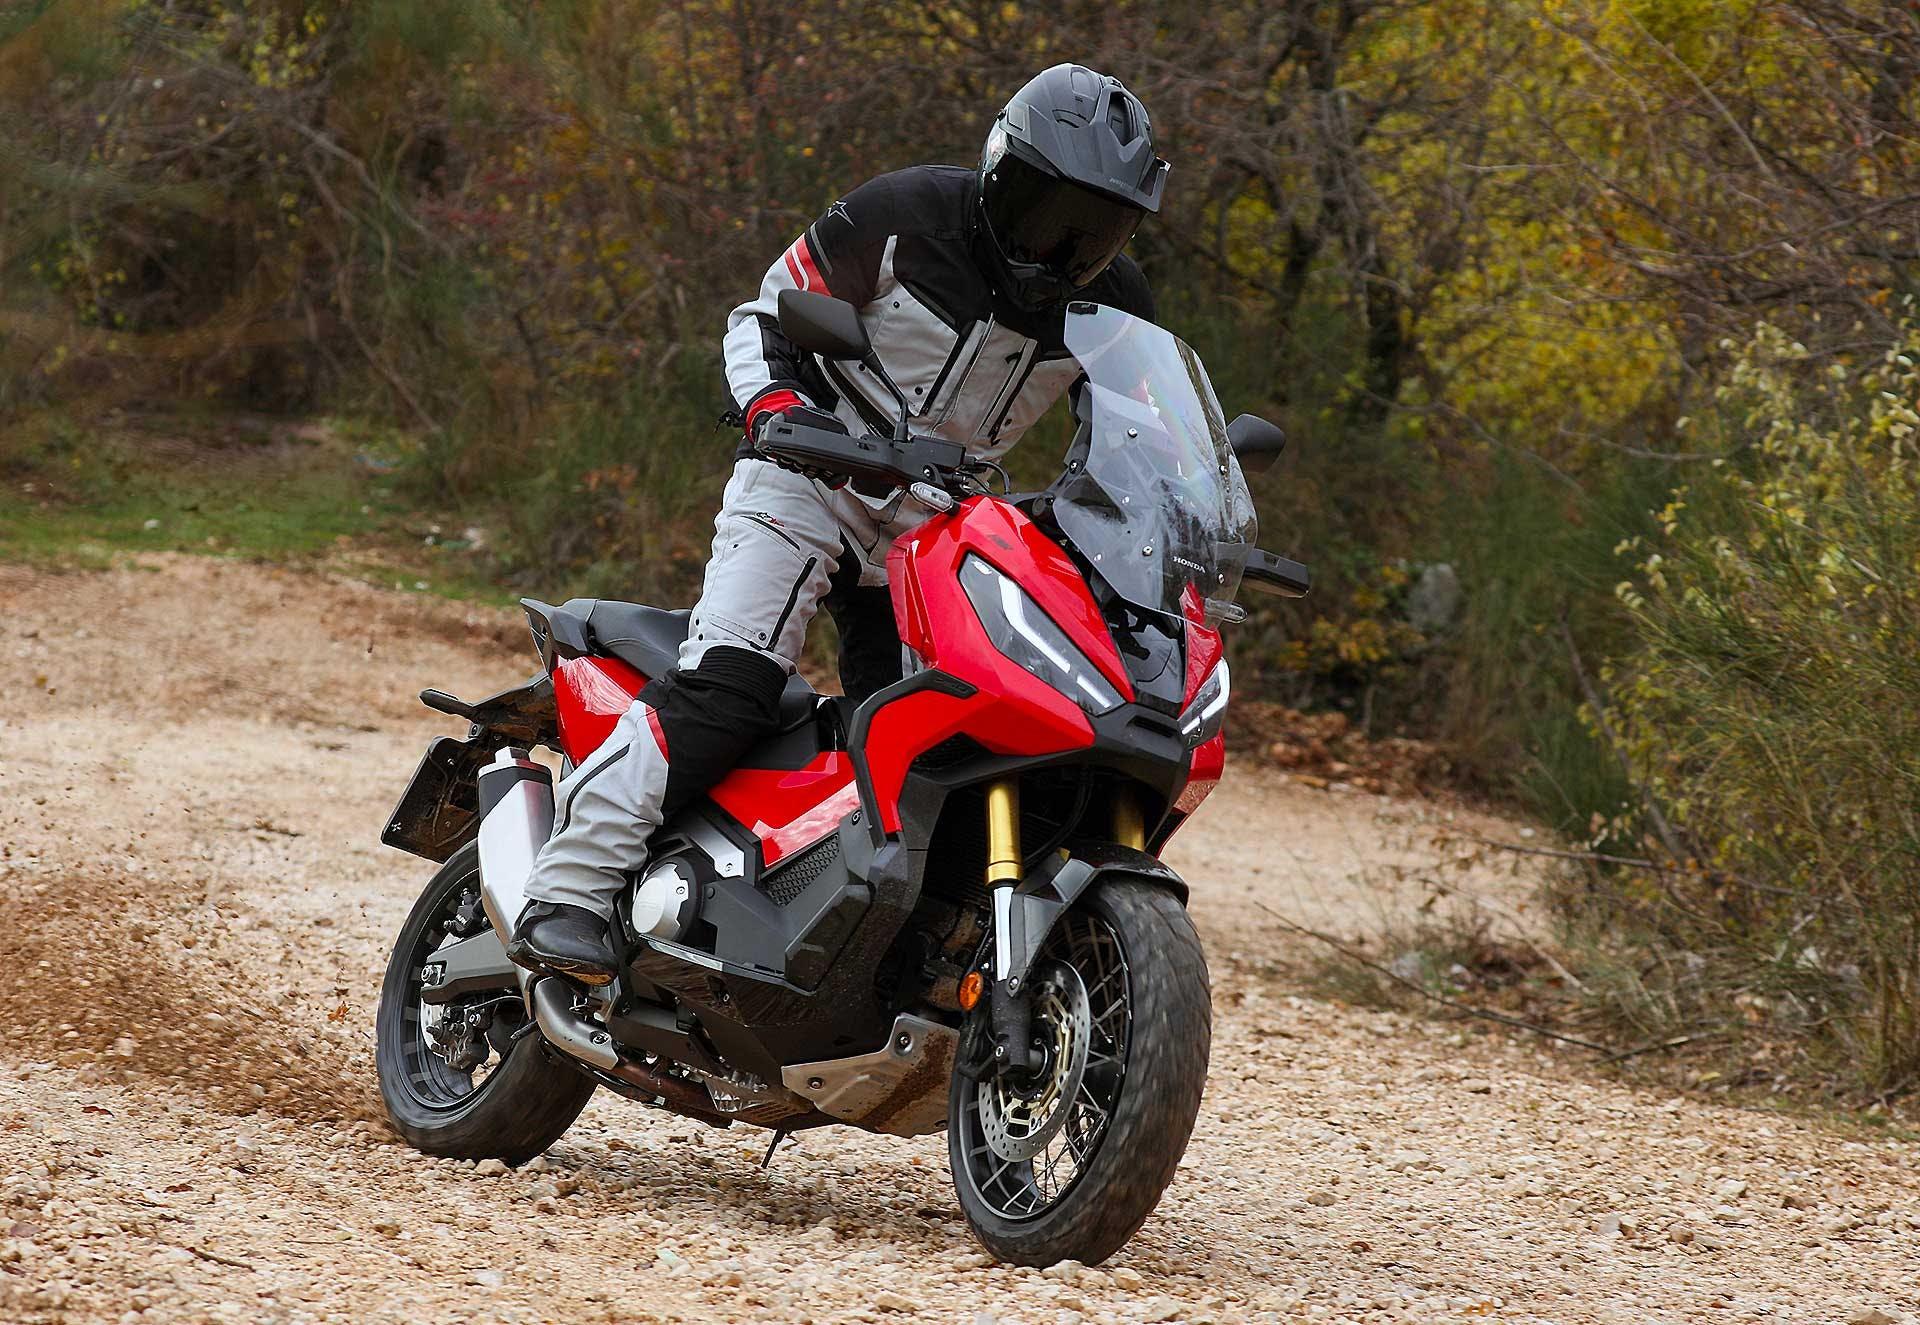 Honda X-ADV 2021 migliori moto per neopatentati A2